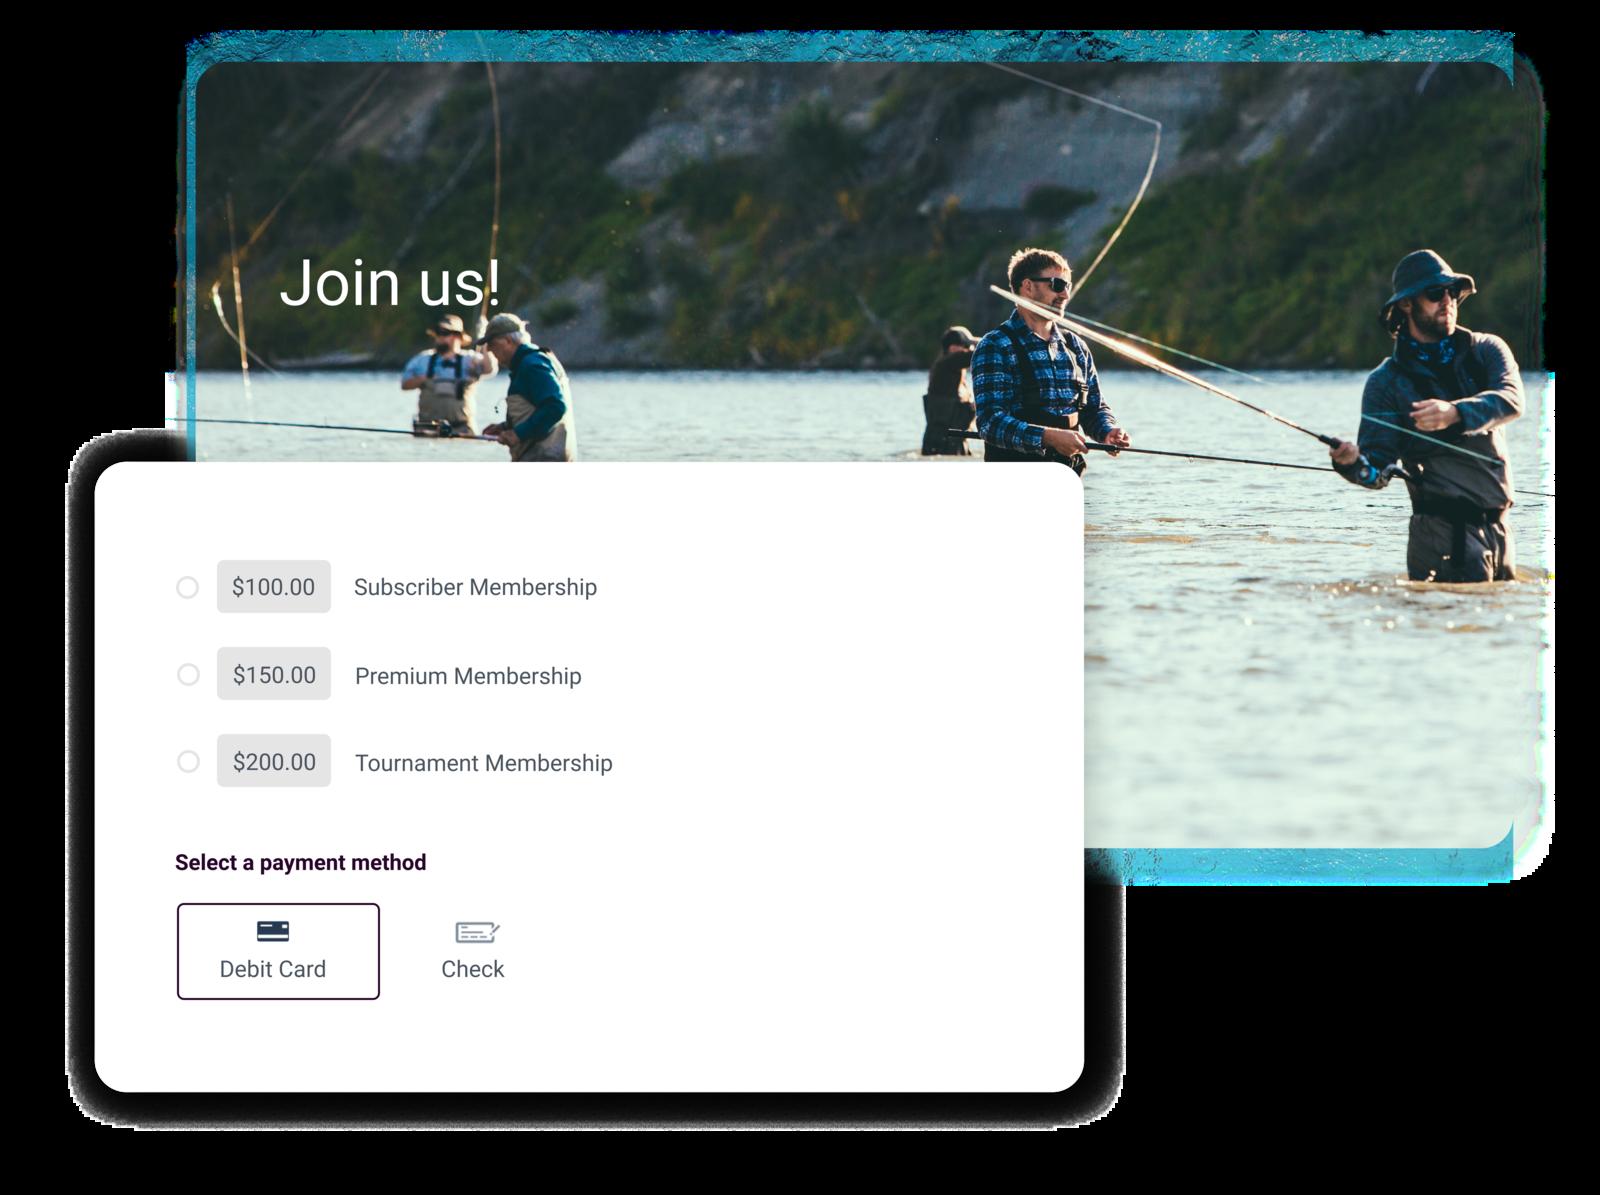 fishing club management software summary